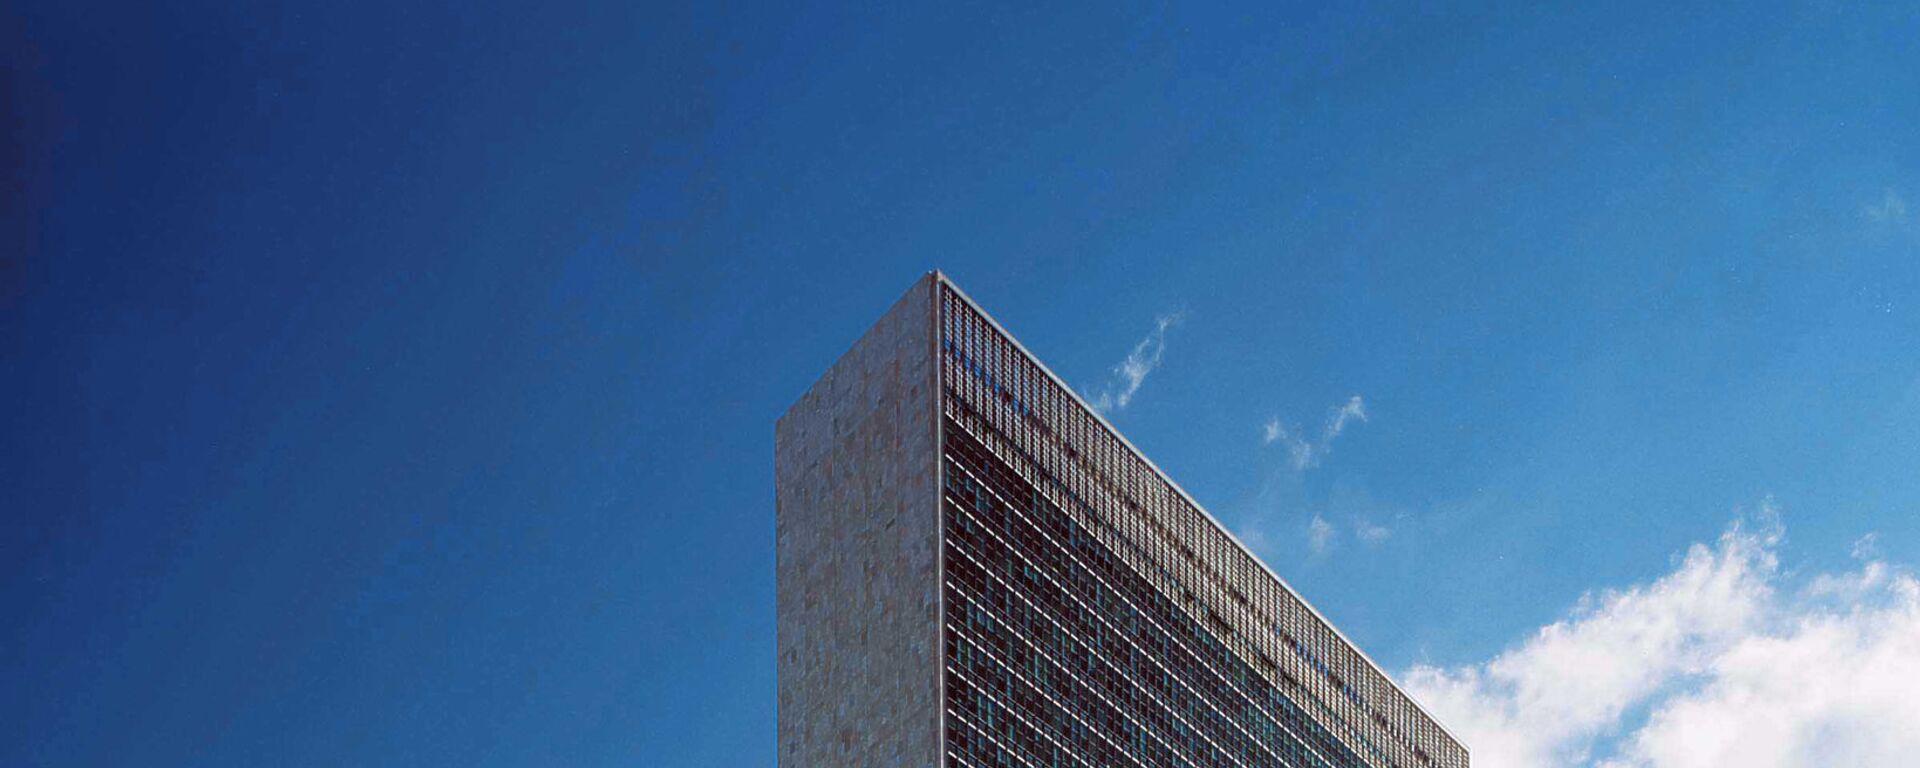 Здание ООН - Sputnik Армения, 1920, 25.09.2021